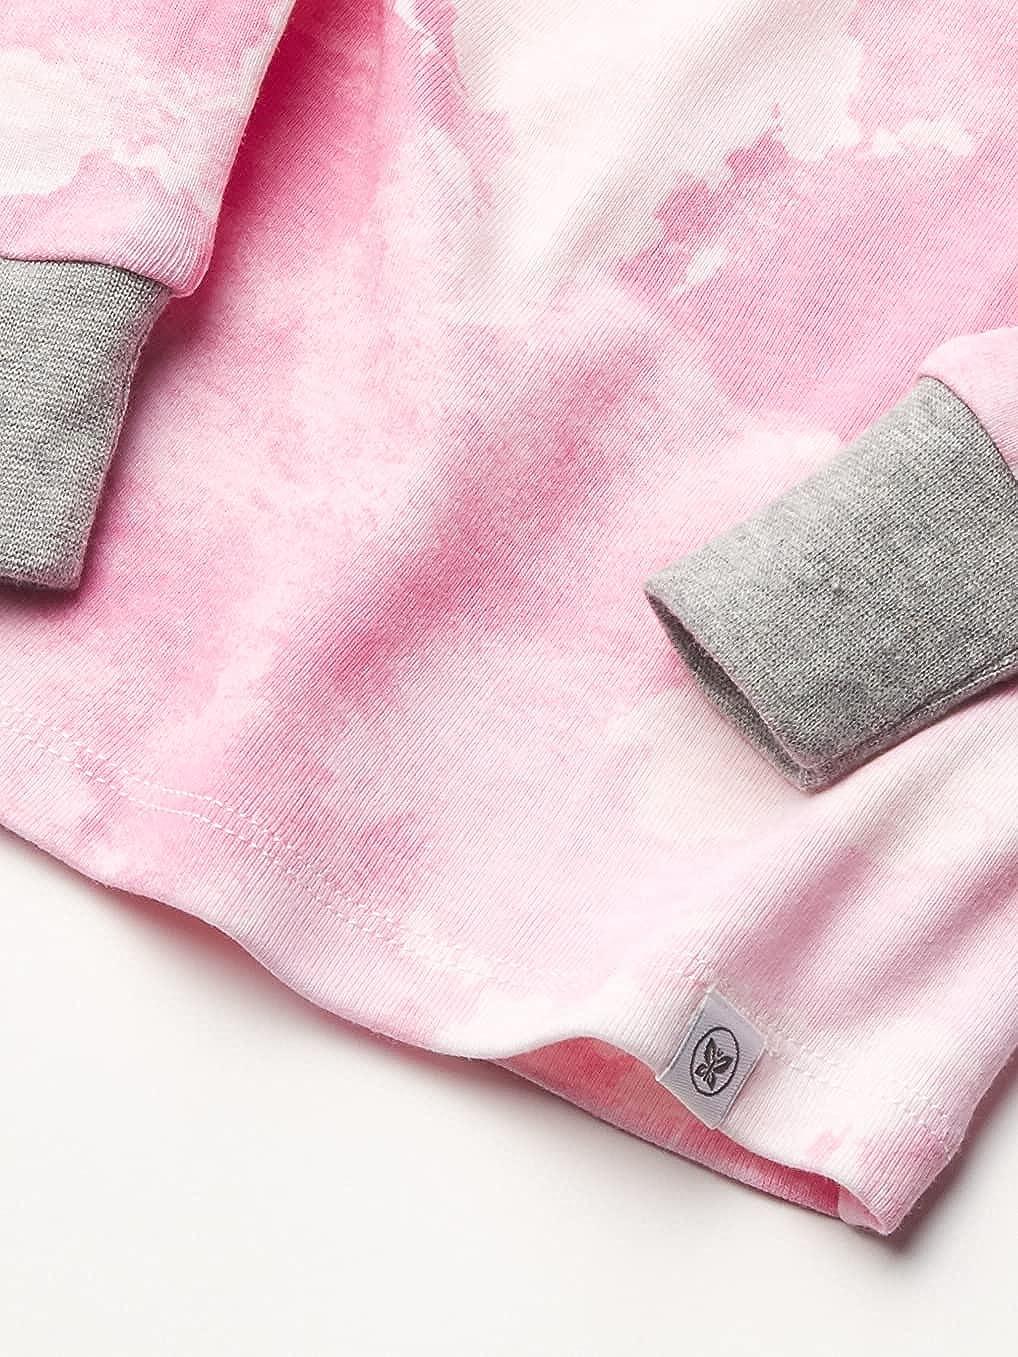 HonestBaby Baby Organic Cotton 2-Piece Snug Fit Pajama Set, Rose Color World, 12 Months